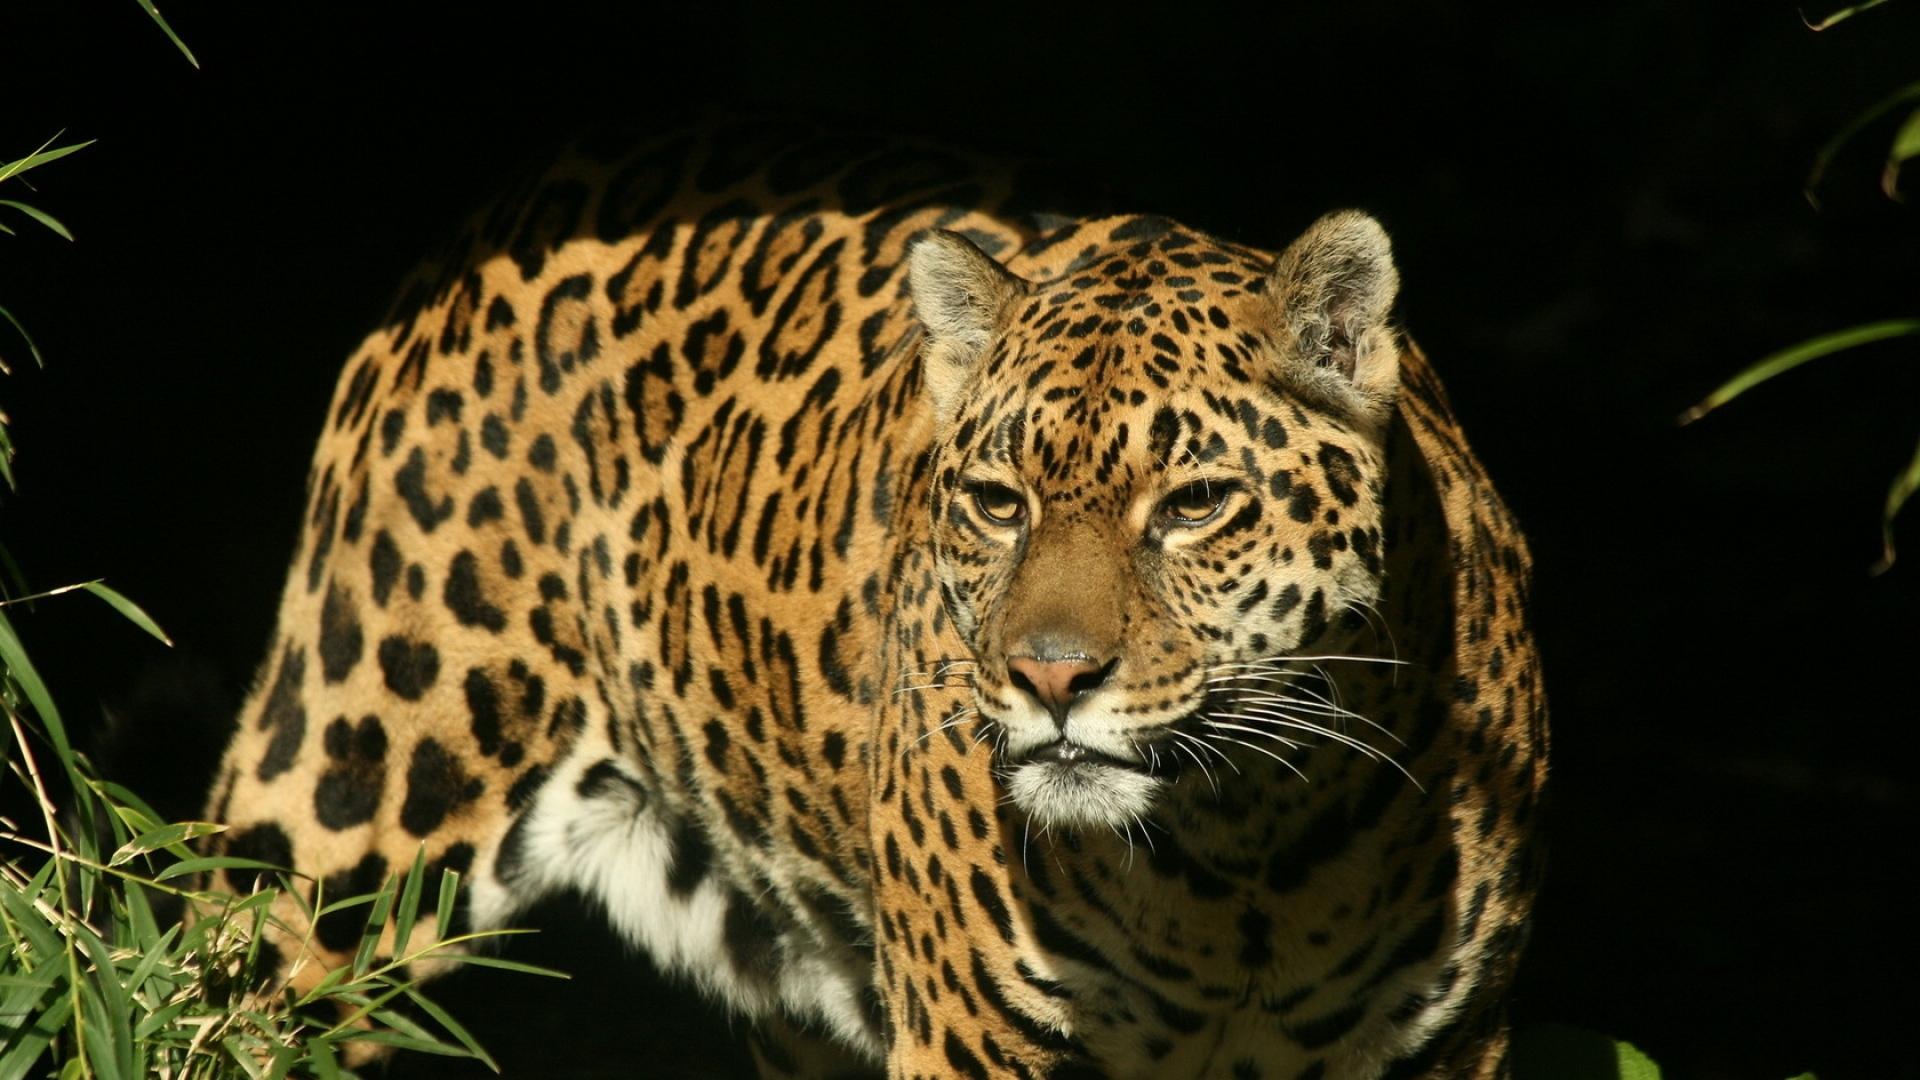 Great Wallpaper Horse High Definition - jaguar_big_cat_spotted_hunting_predator_51092_1920x1080  Gallery_4350.jpg